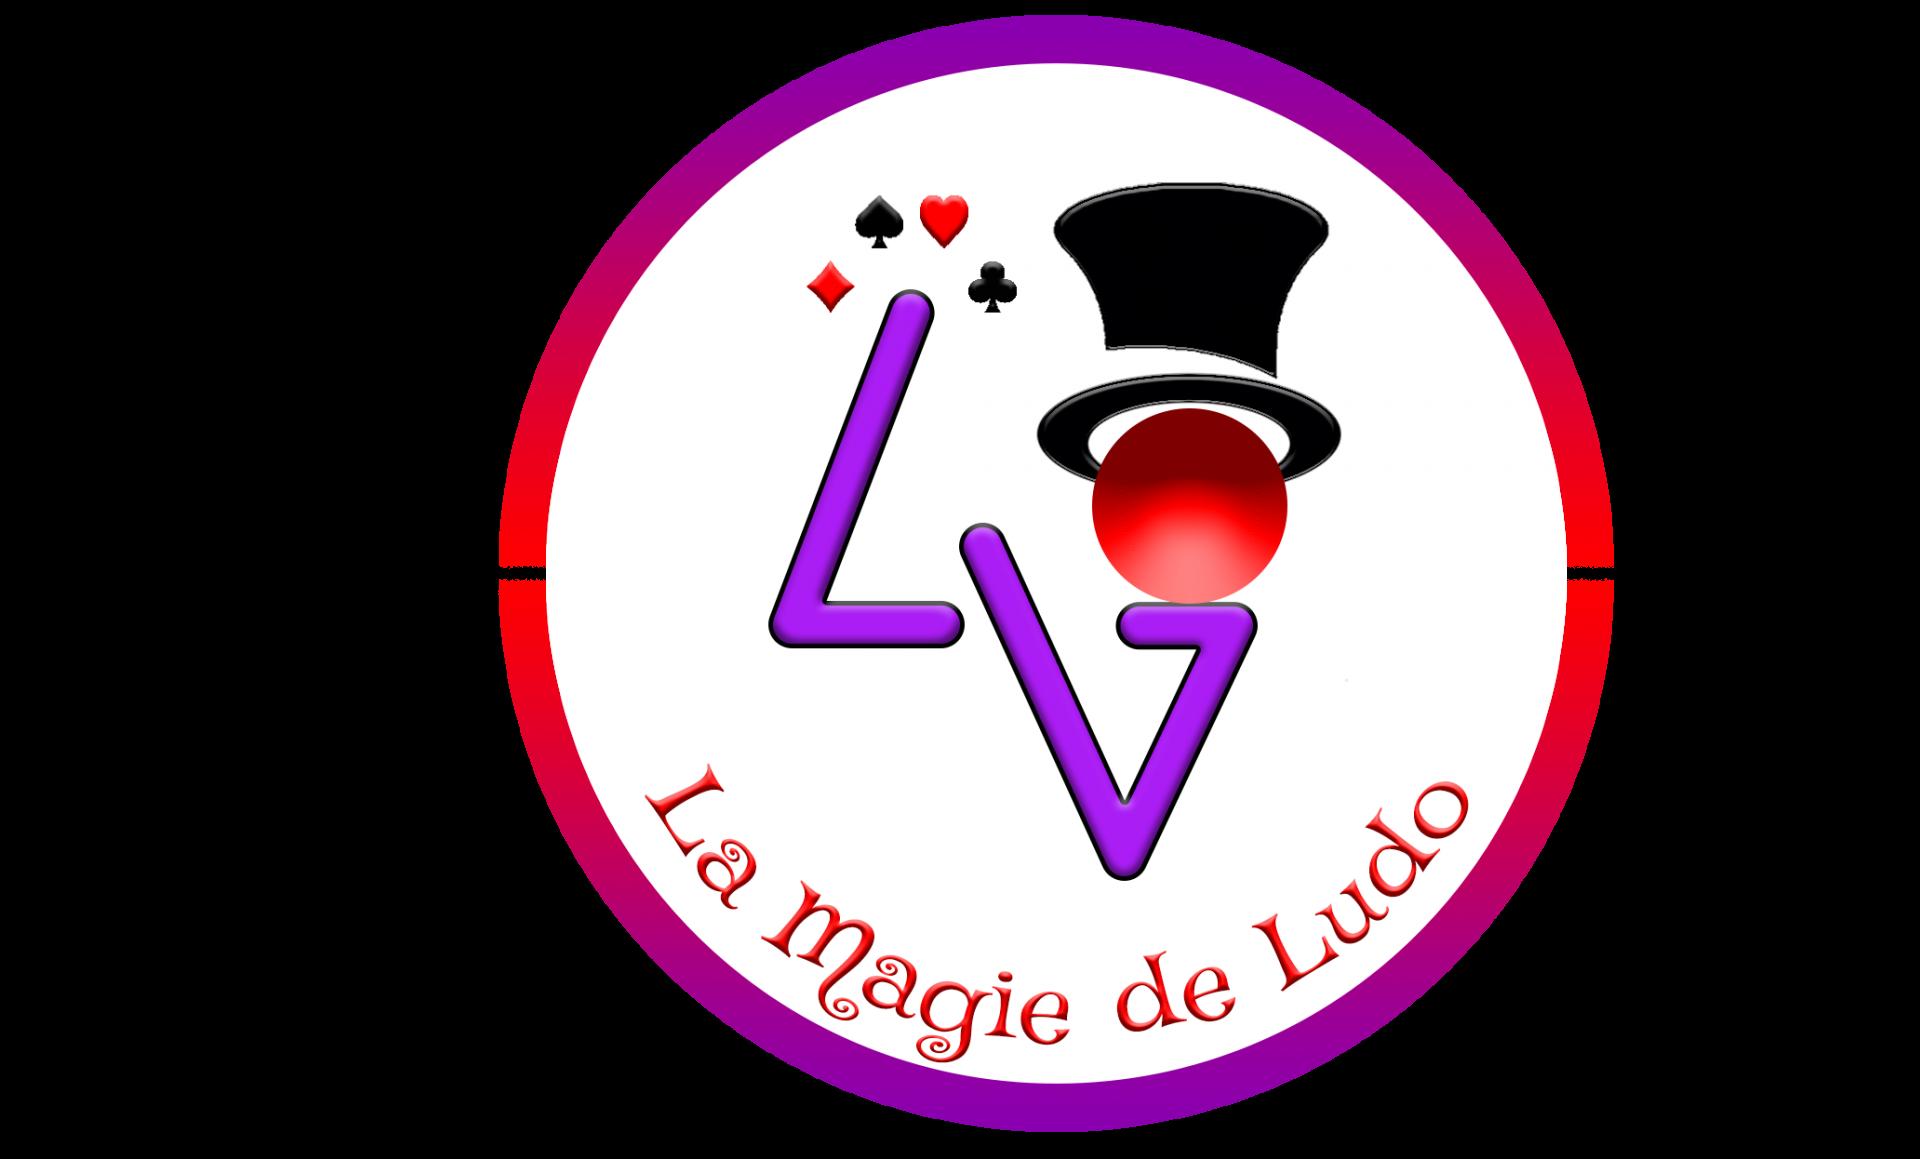 La Magie de Ludo